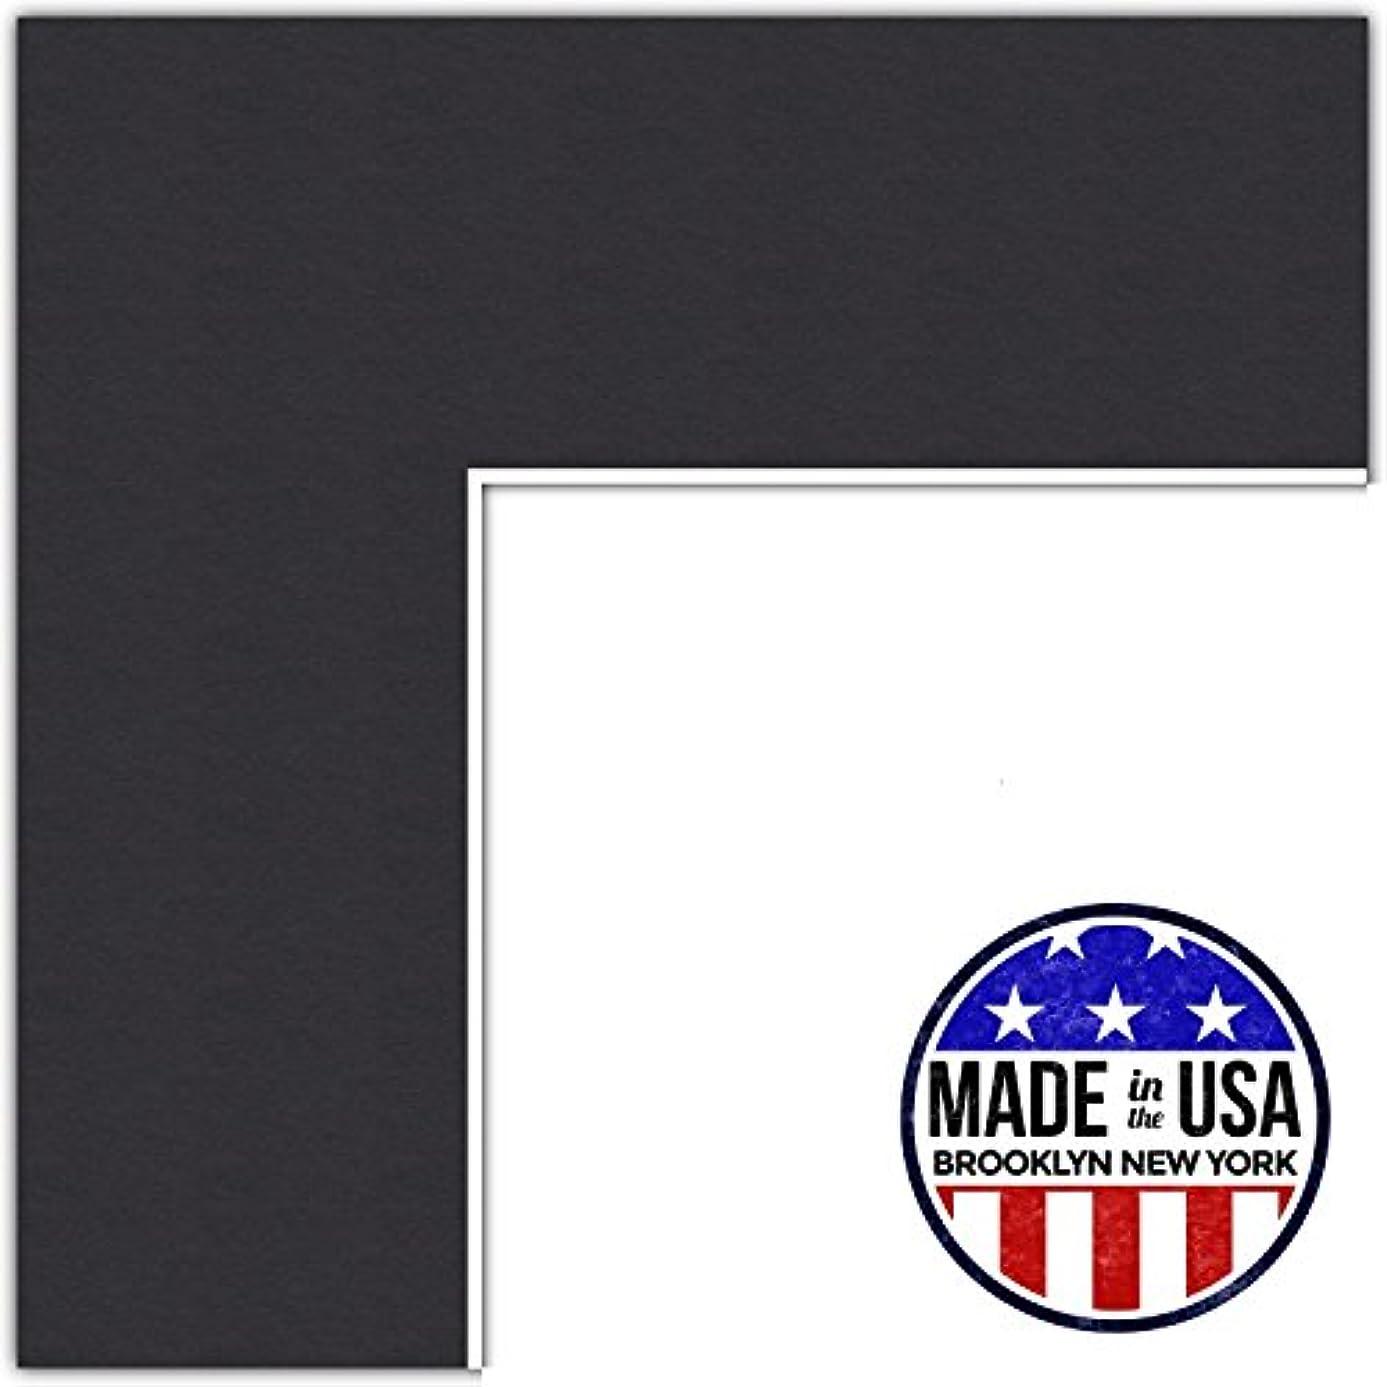 ArtToFrames MAT-21-11x36-Black 11x36 Smooth Black Custom Mat